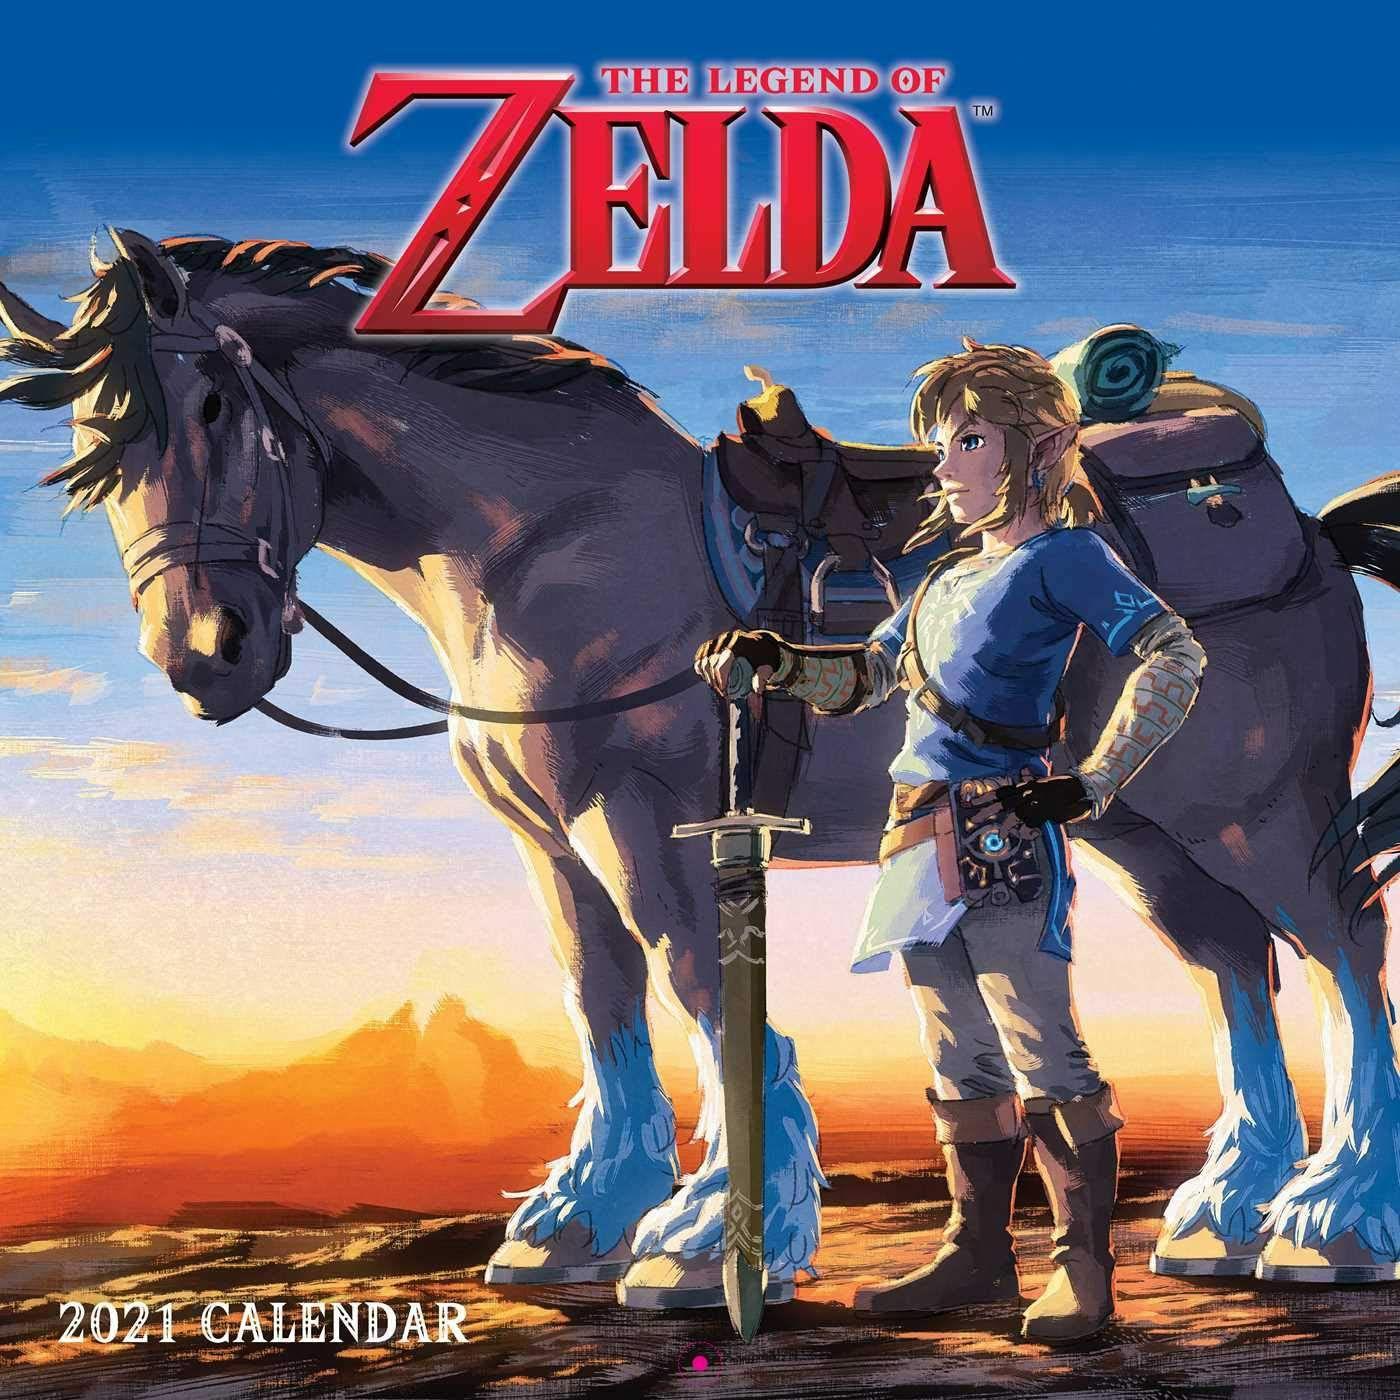 Amazon: Calendario The Legend of Zelda Breath of the Wild 2021